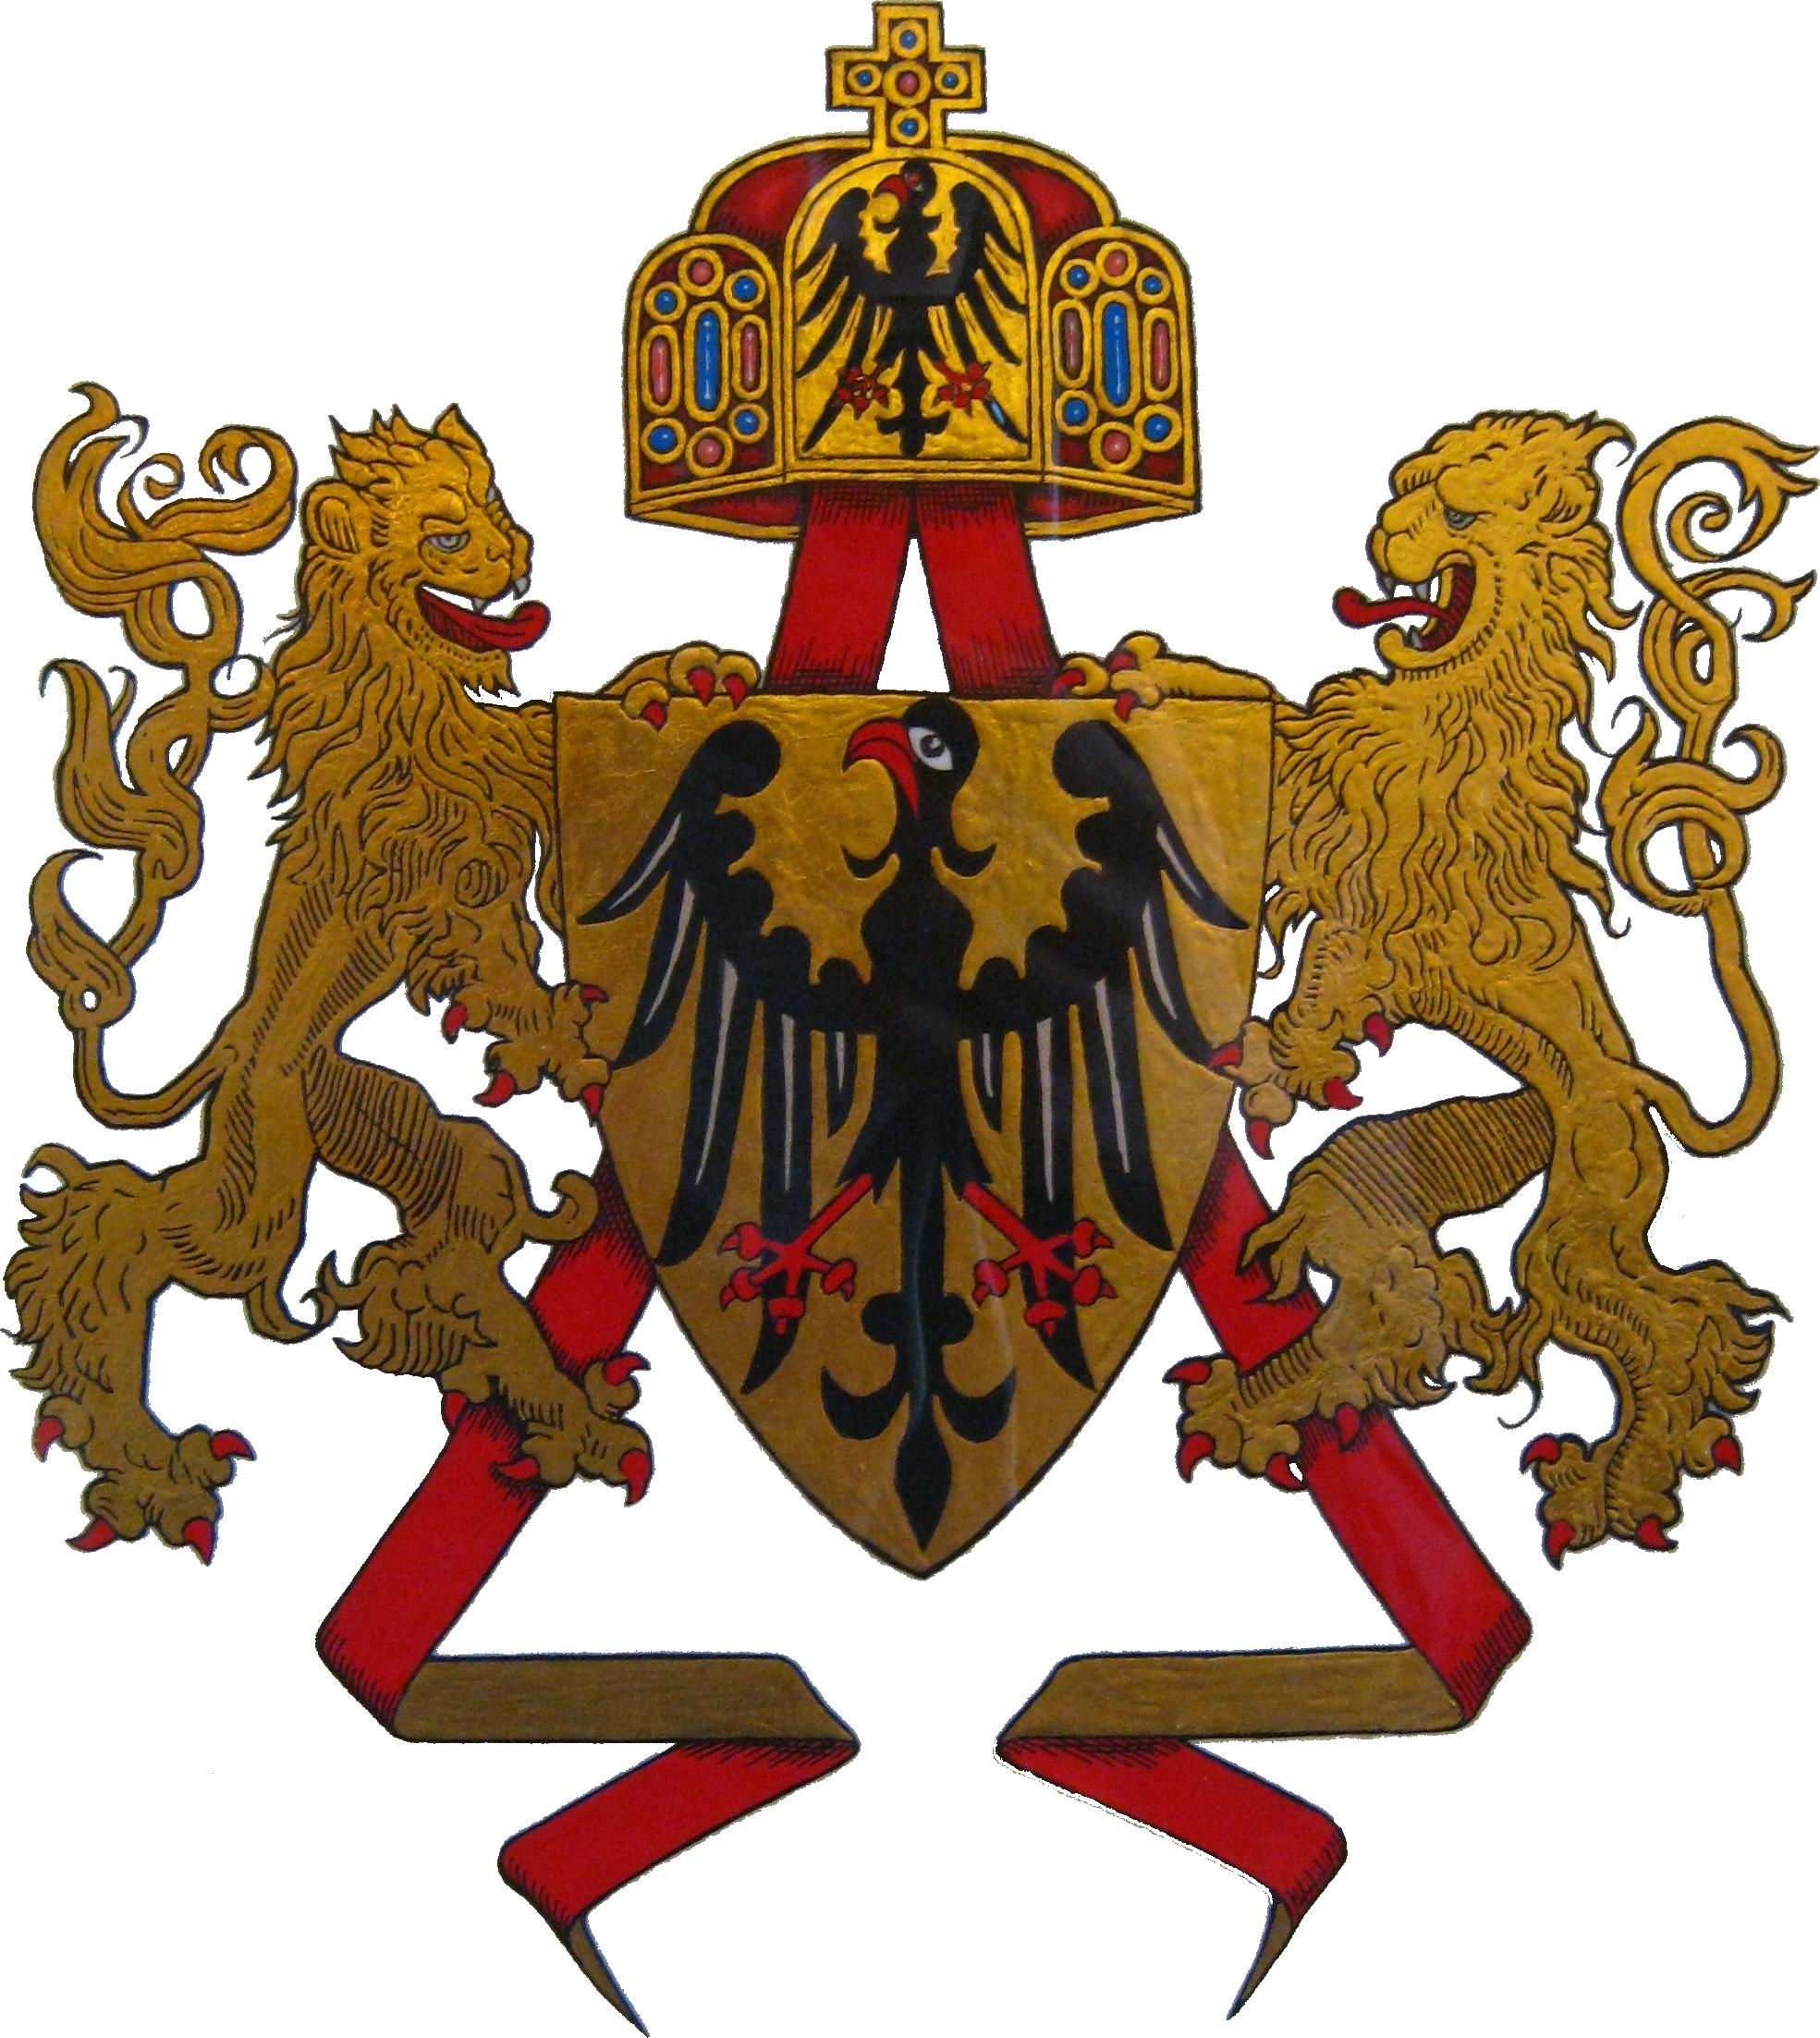 File:Großes Wappen der Stadt Aachen.png.